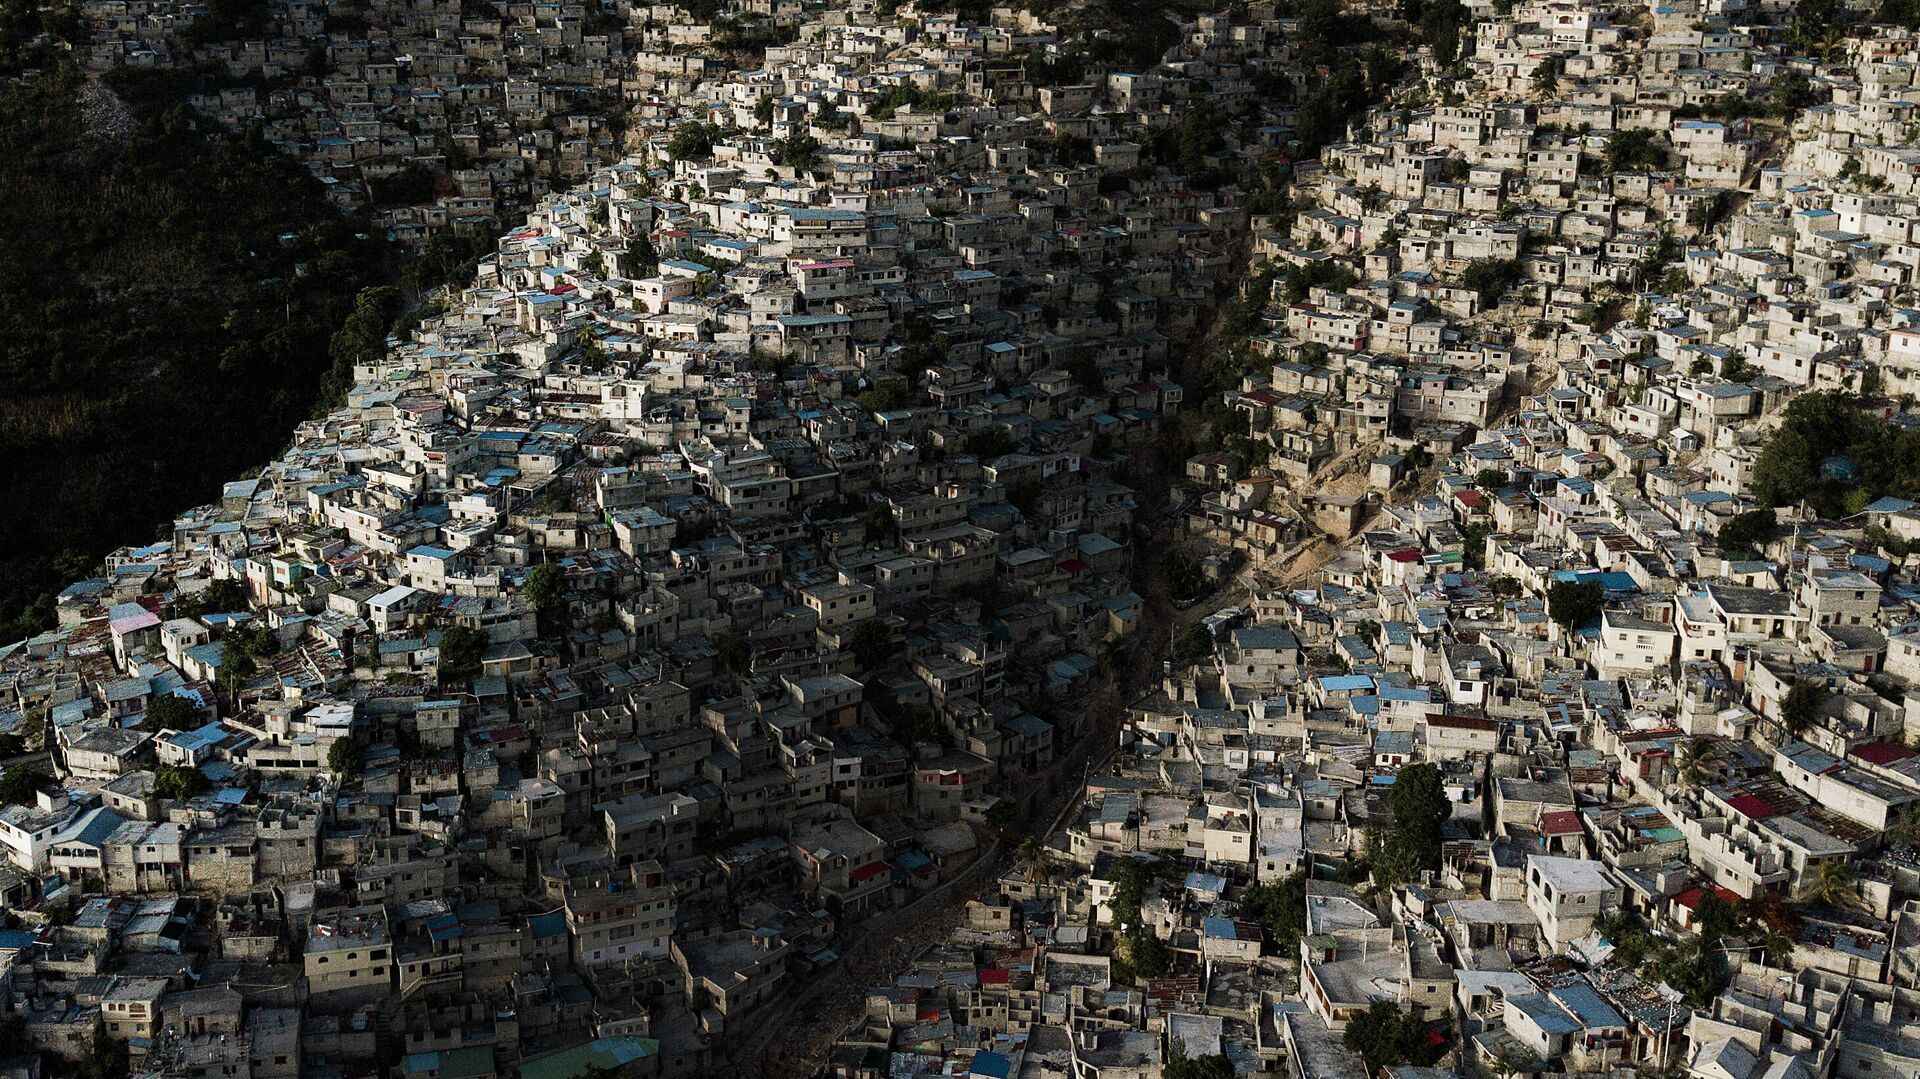 Puerto Príncipe, la capital haitiana   - Sputnik Mundo, 1920, 15.07.2021